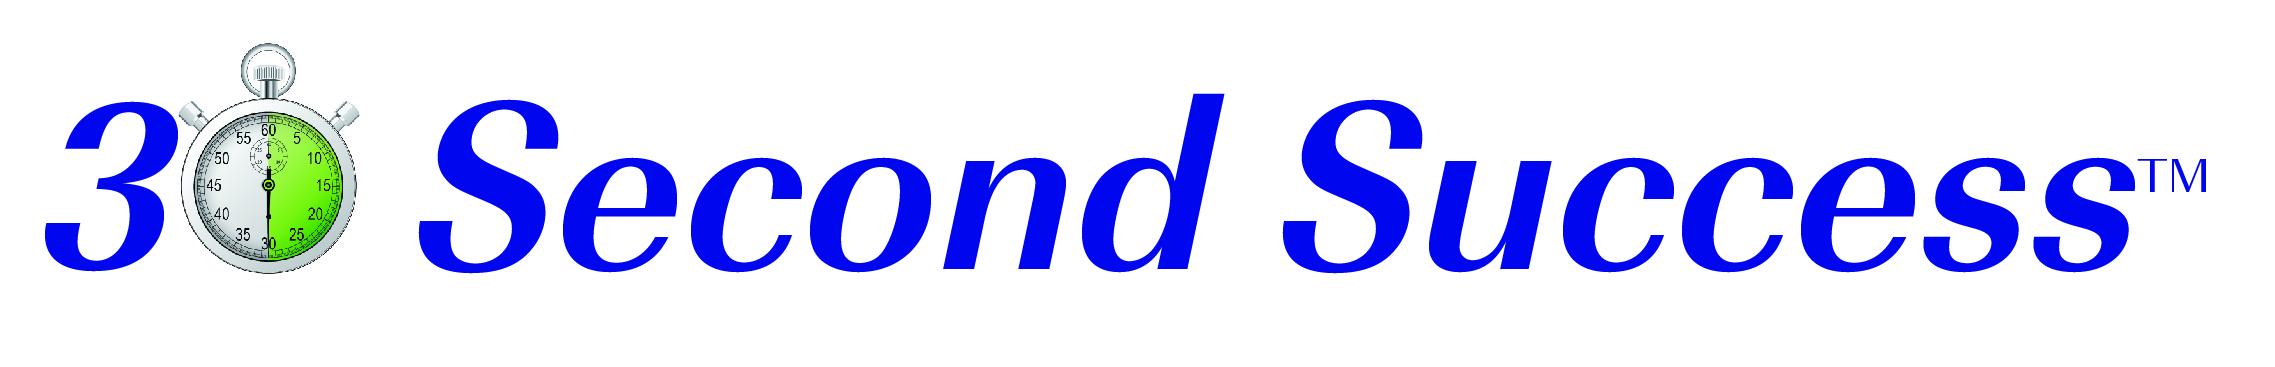 30 Second Success Logo w clock_tm-01.jpg